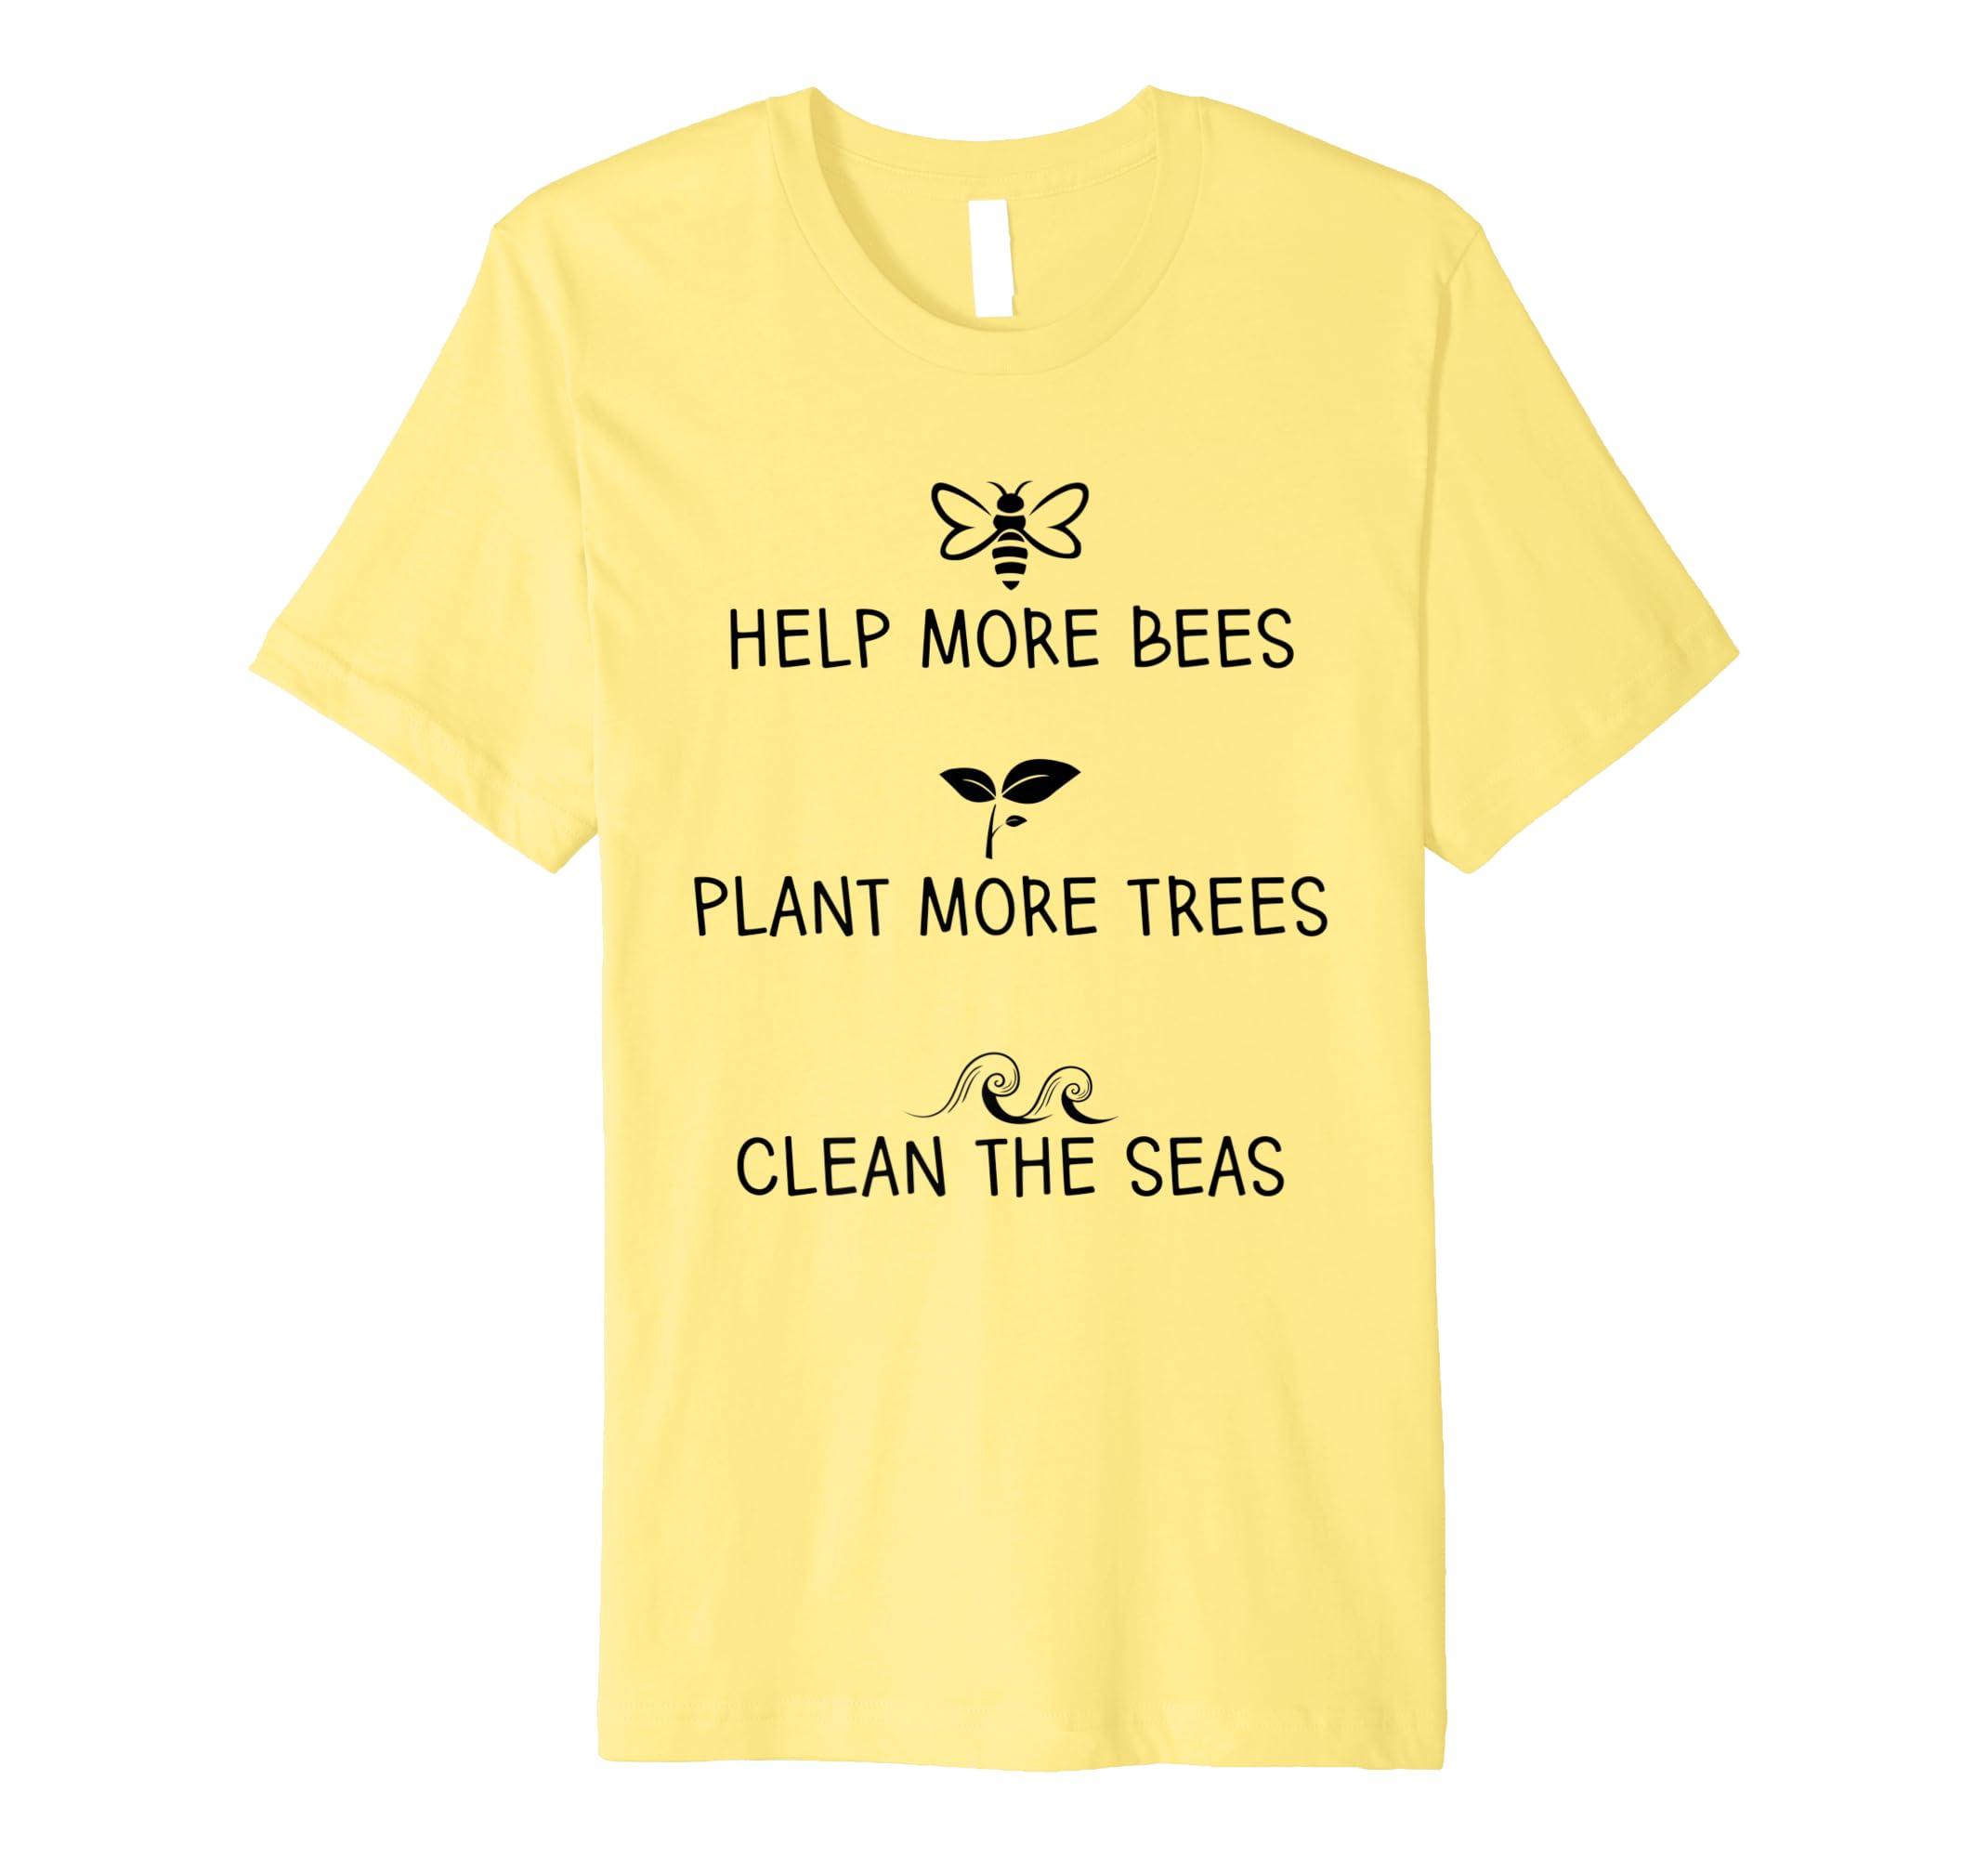 052b20b2ecd86 Help More Bees Plant More Tree Clean The Seas T-Shirt Yellow: Amazon ...